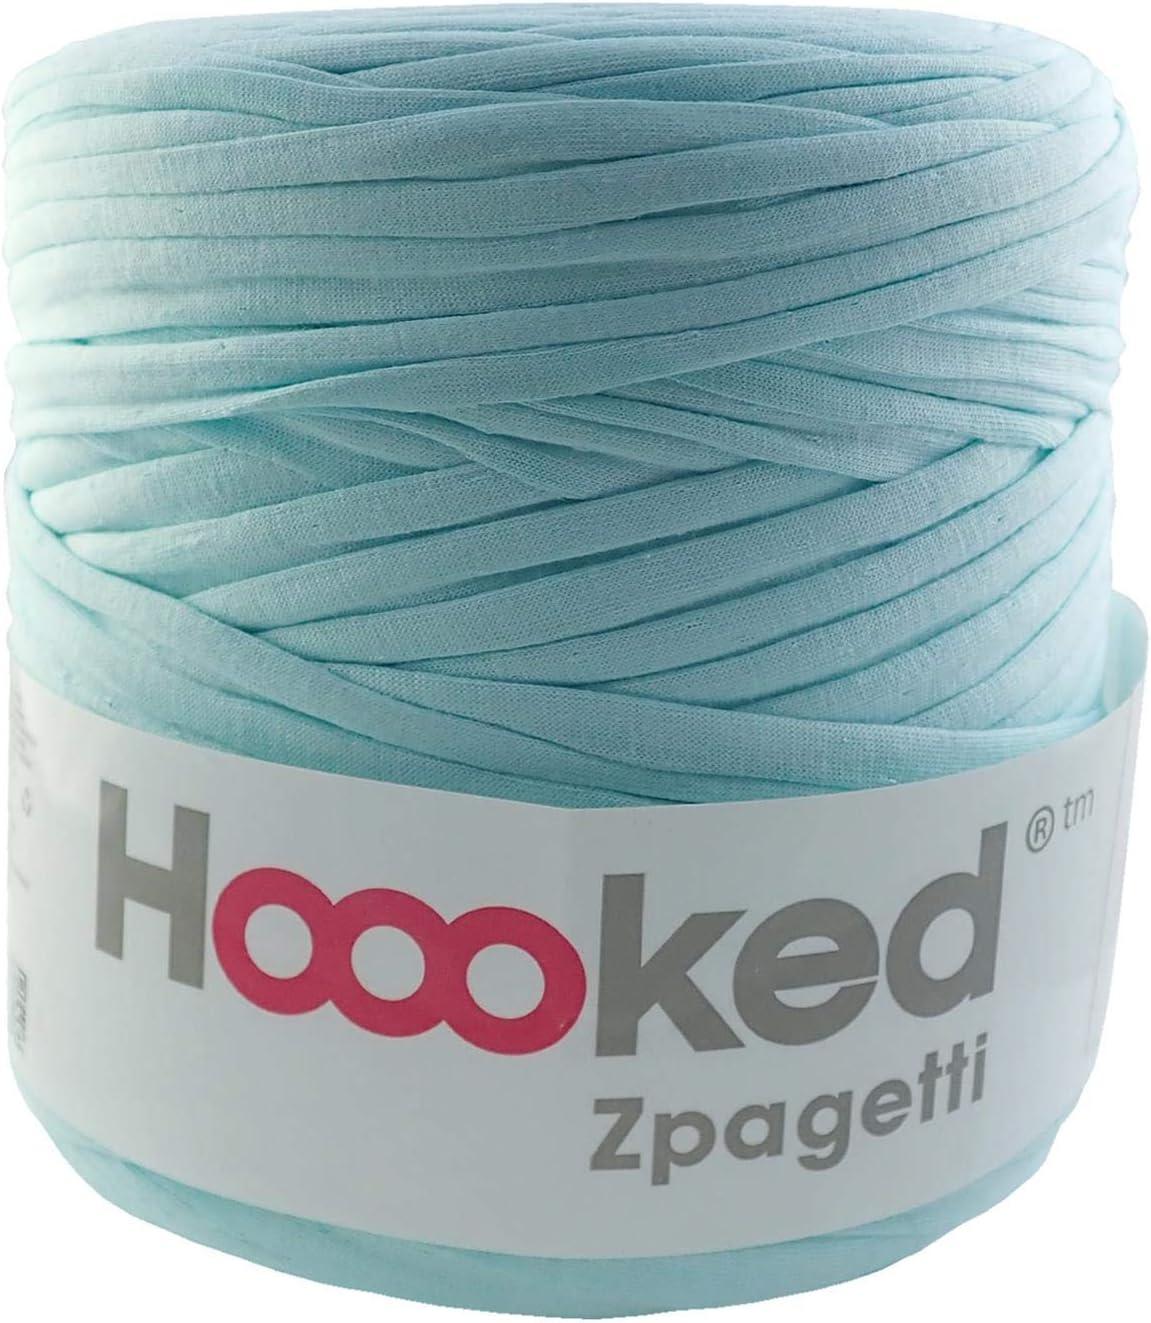 120 m Ovillo de lana para camiseta 700 g Hoooked Zpagetti